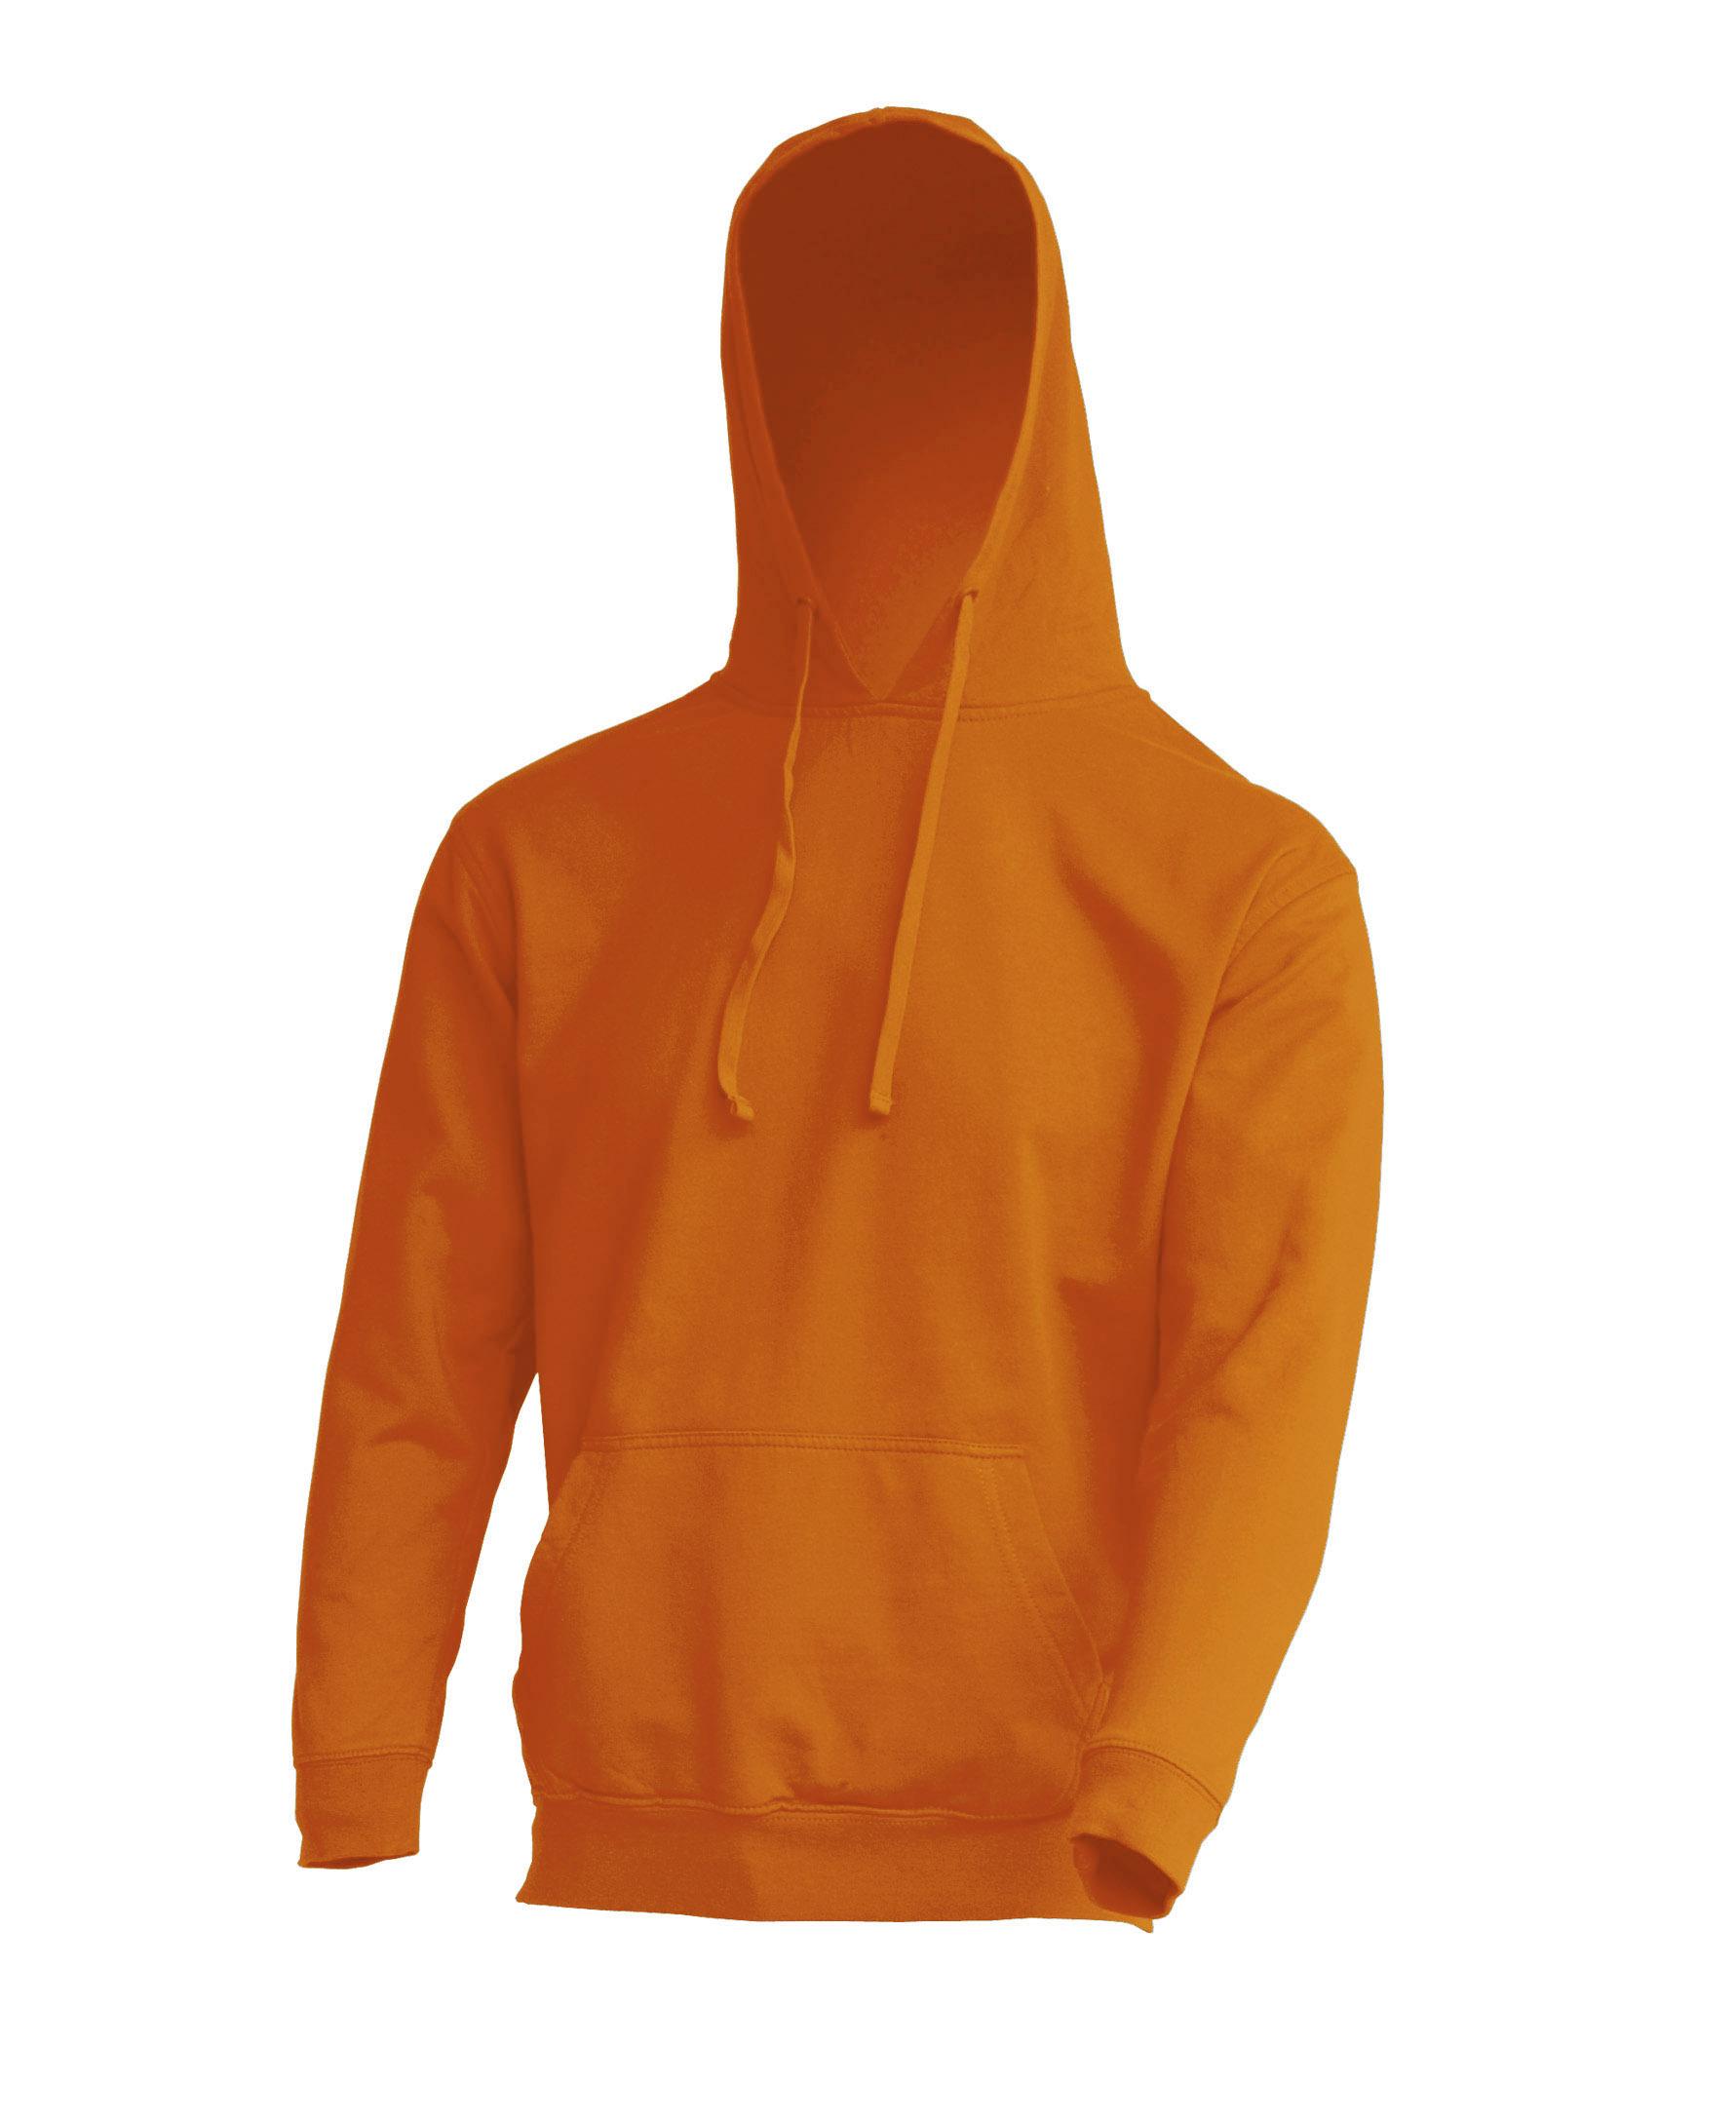 Majica muška KANGAROO narančasta